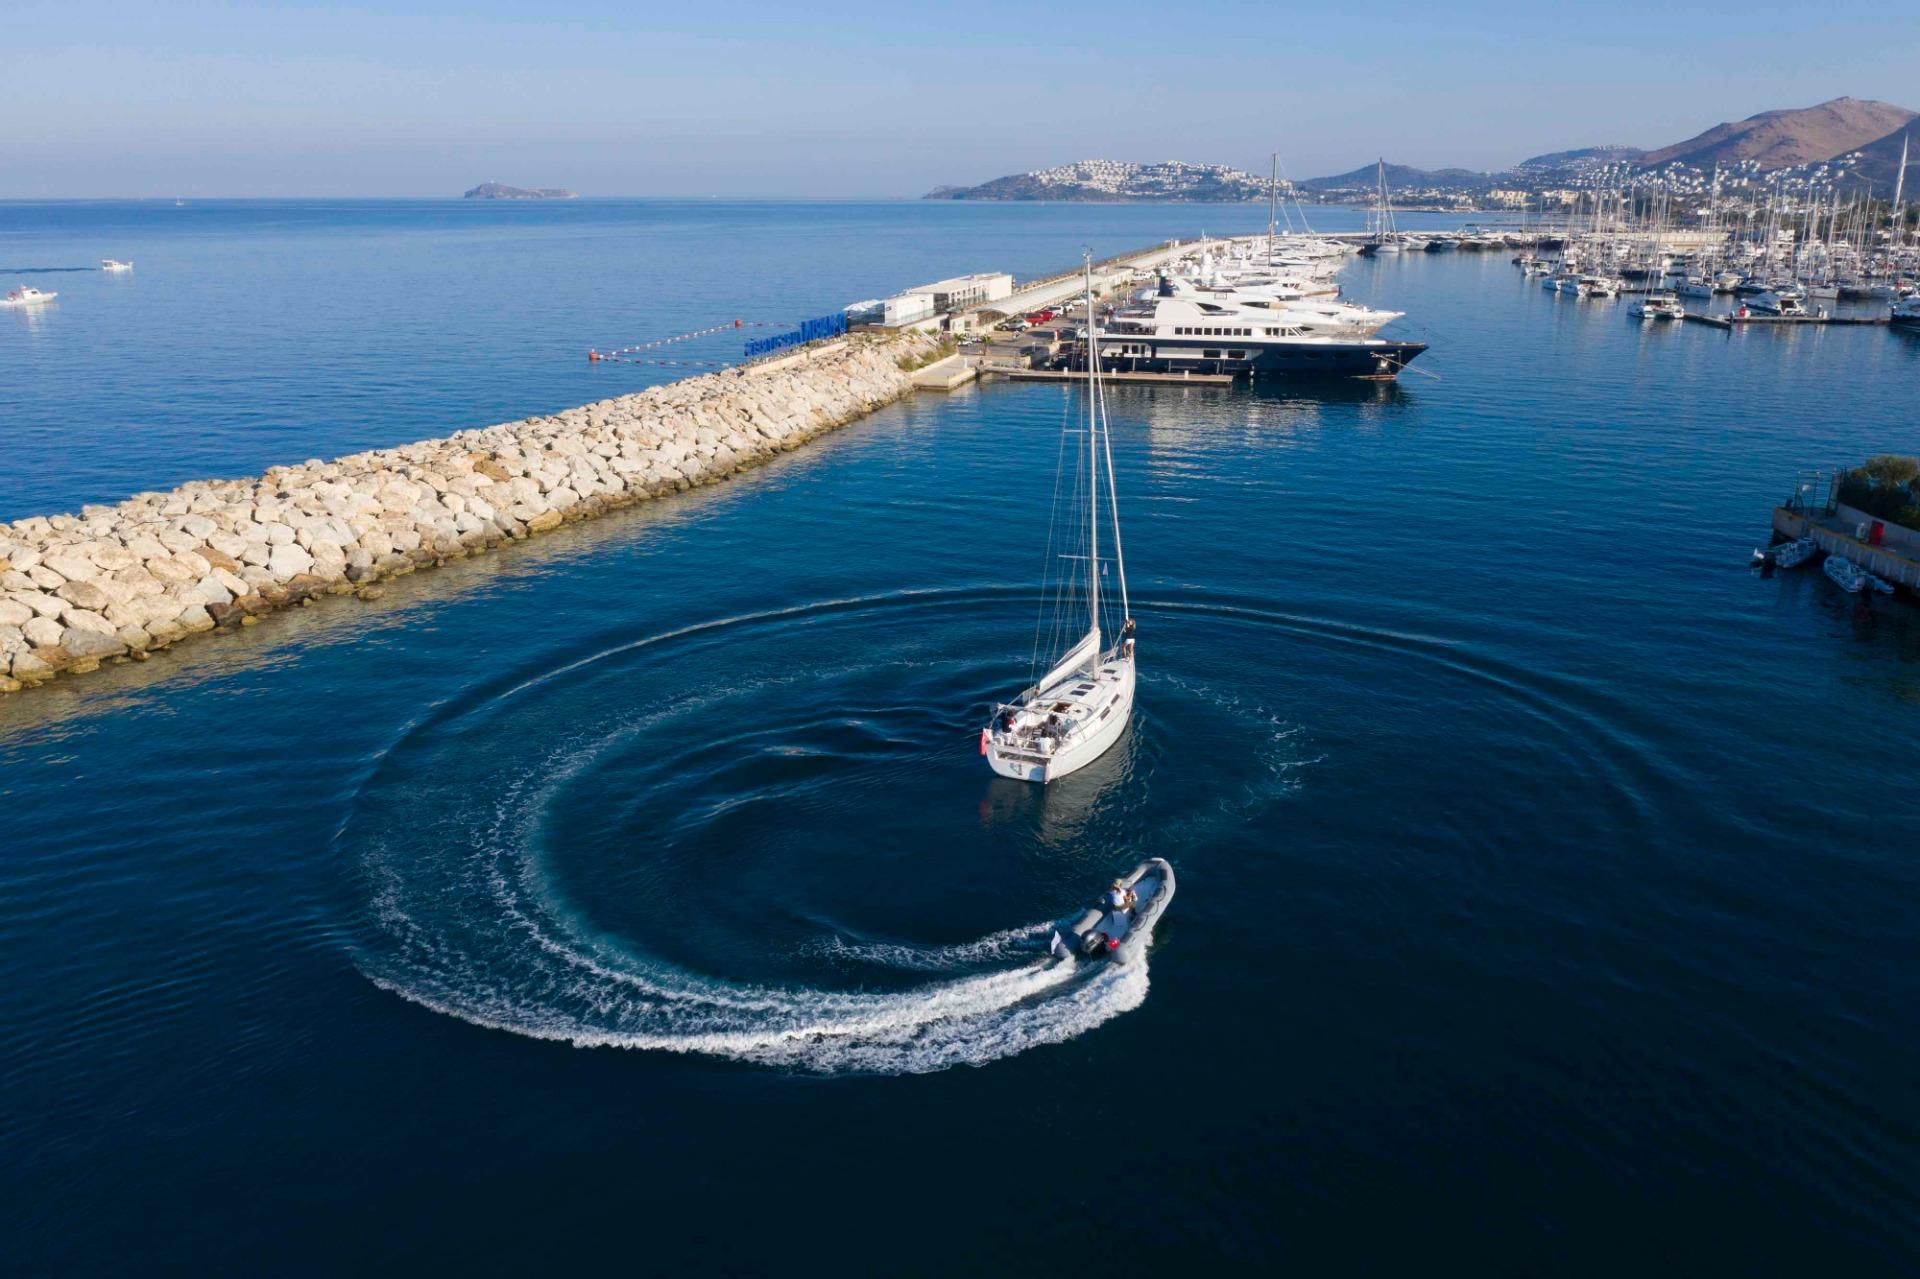 Marina Turgutreis in Turkey: our flagship marina | D-Marin